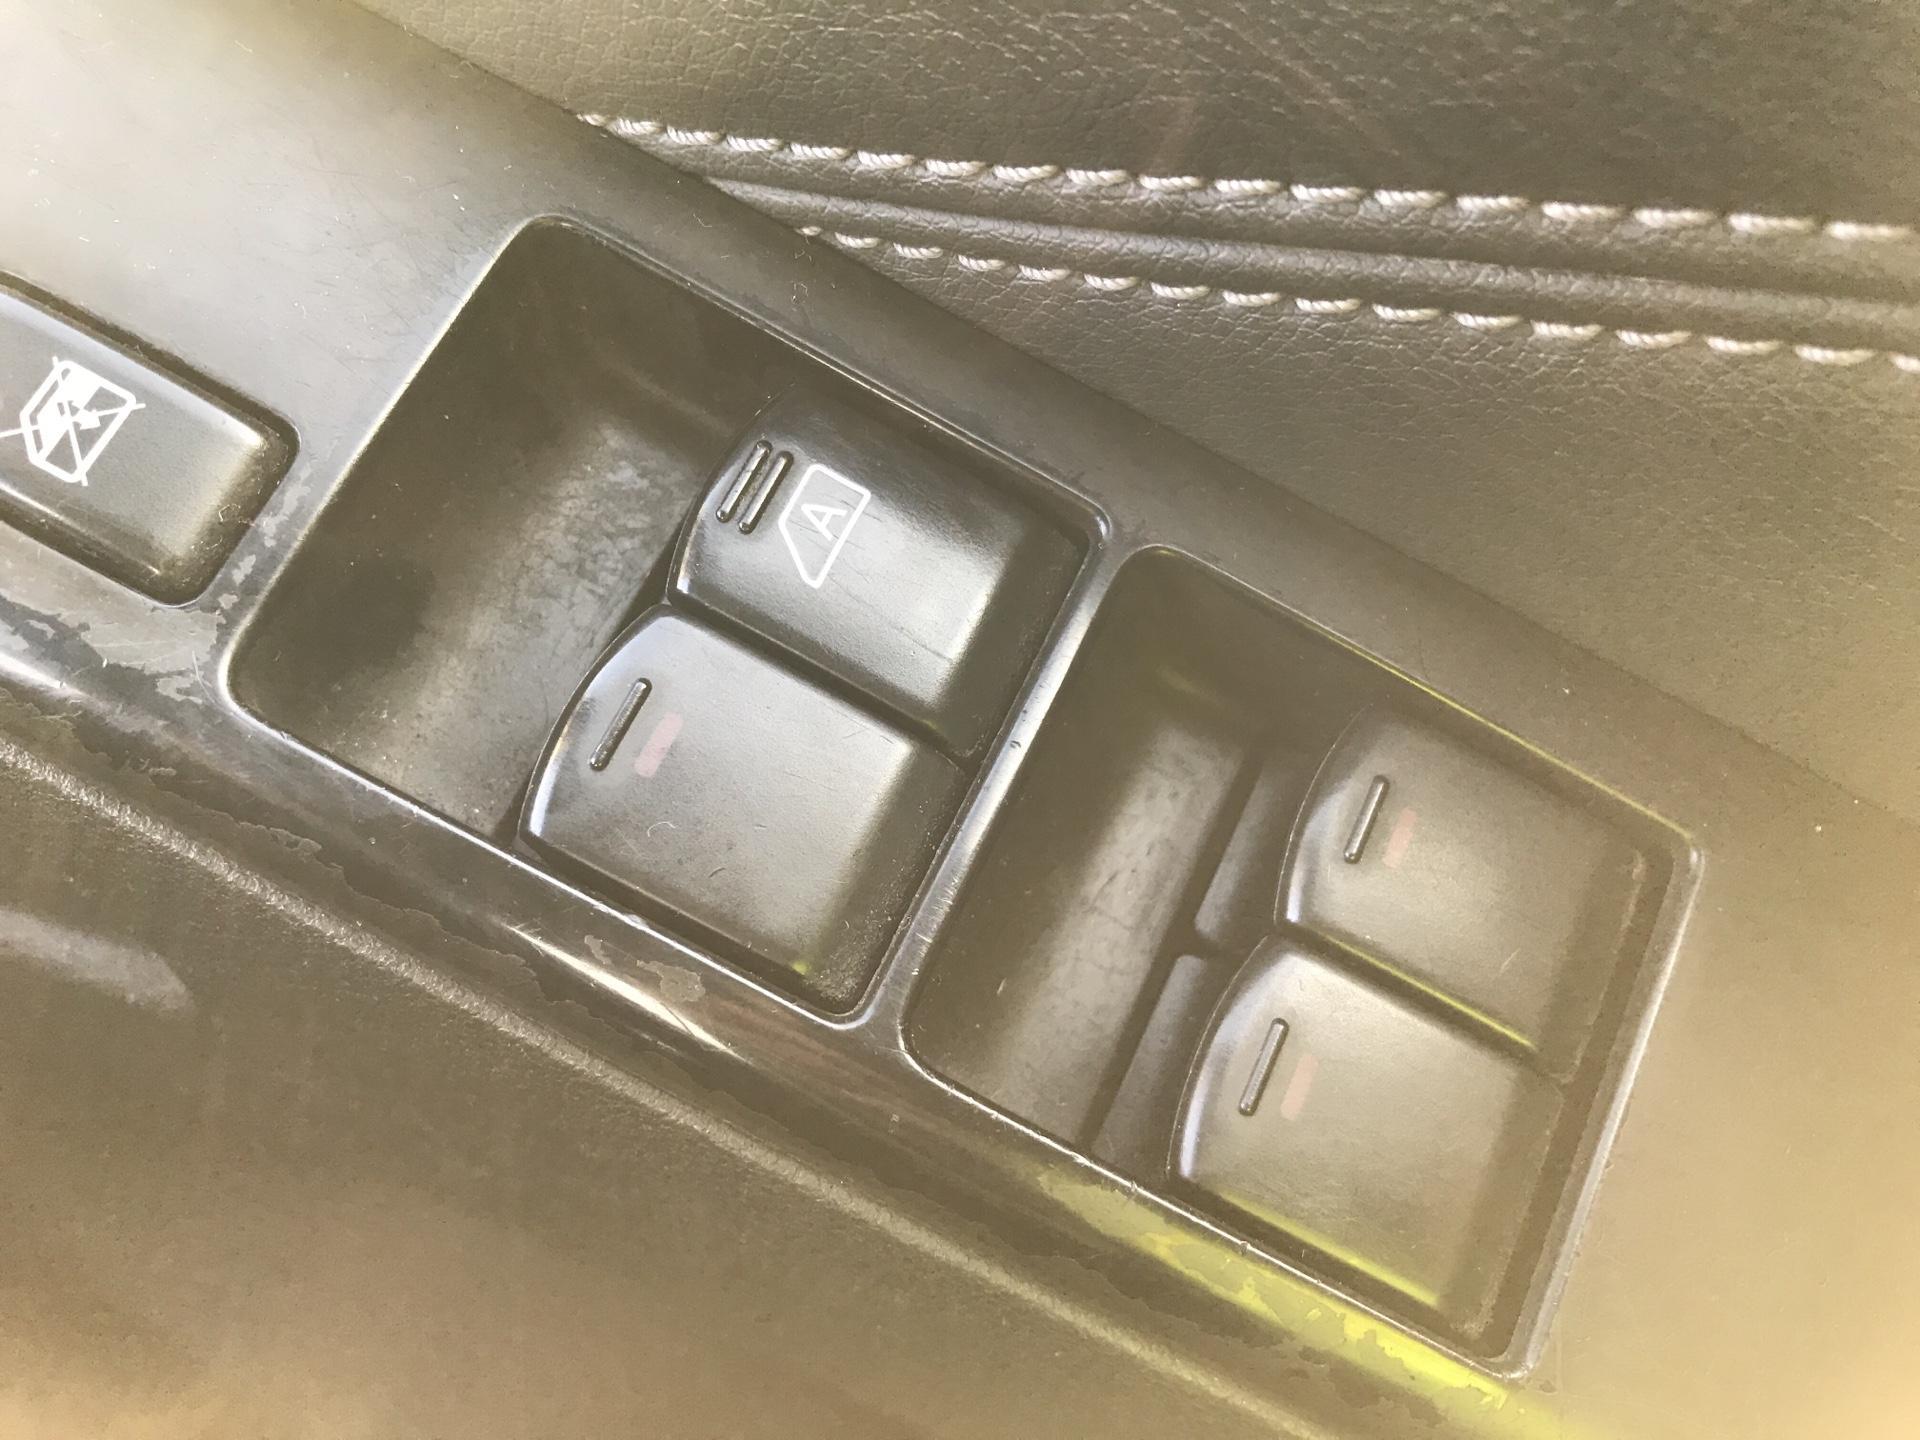 2011 Nissan Navara TEKNA 2.5 DCI 188 DOUBLE CAB AUTO EURO 4 (YX11WZV) Image 23